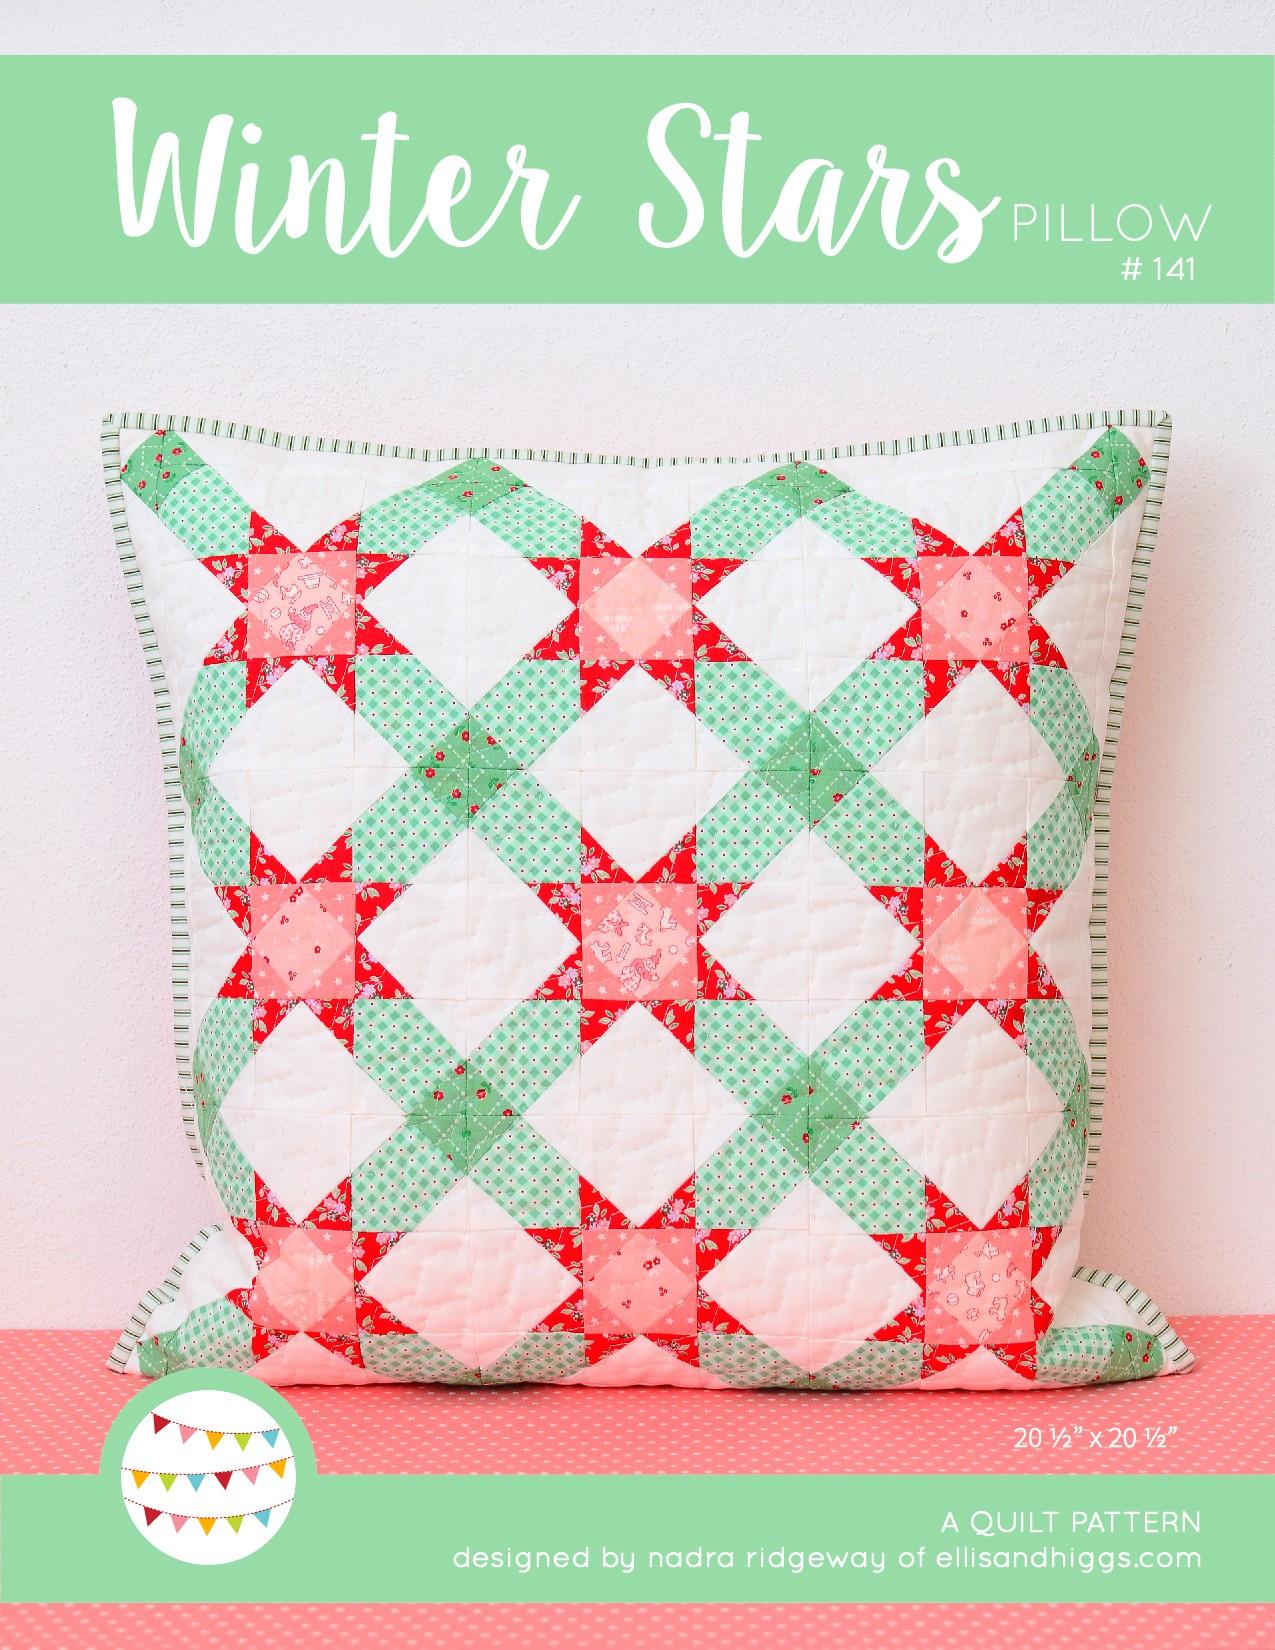 Winter Stars Pillow Mini Quilt Pattern - Christmas Quilt Pattern